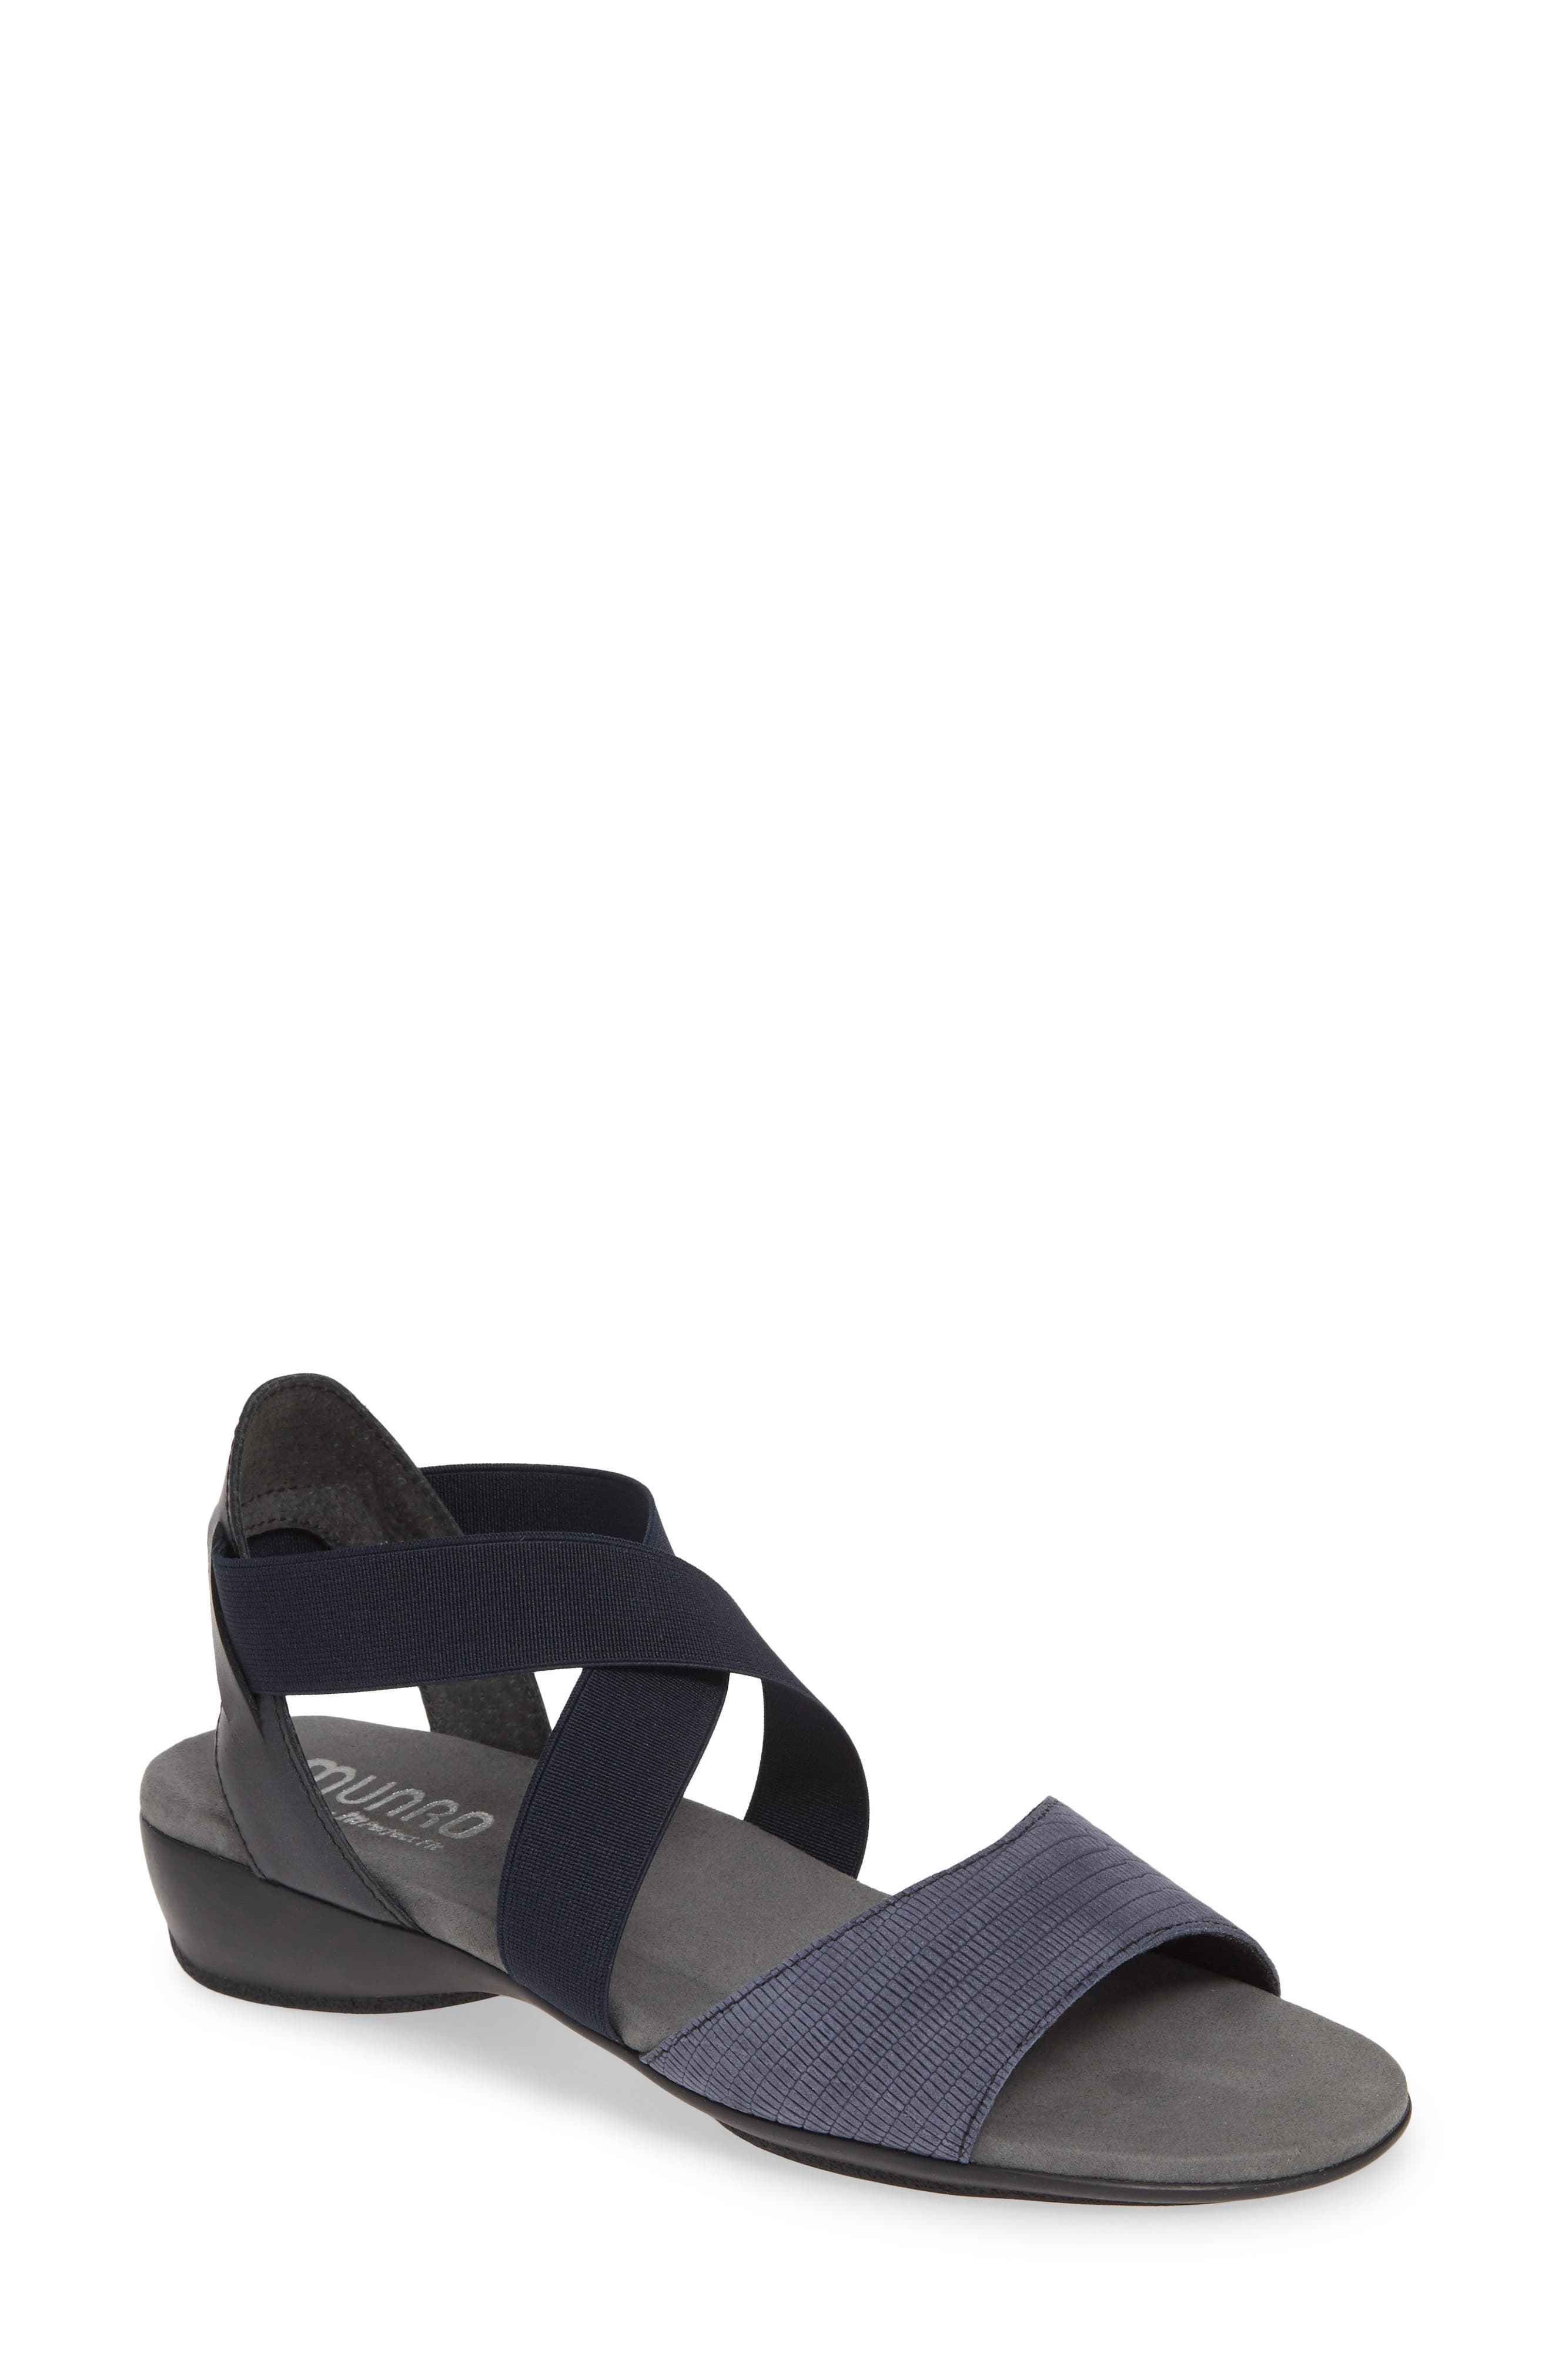 Munro Caley Wedge Sandal (Women)